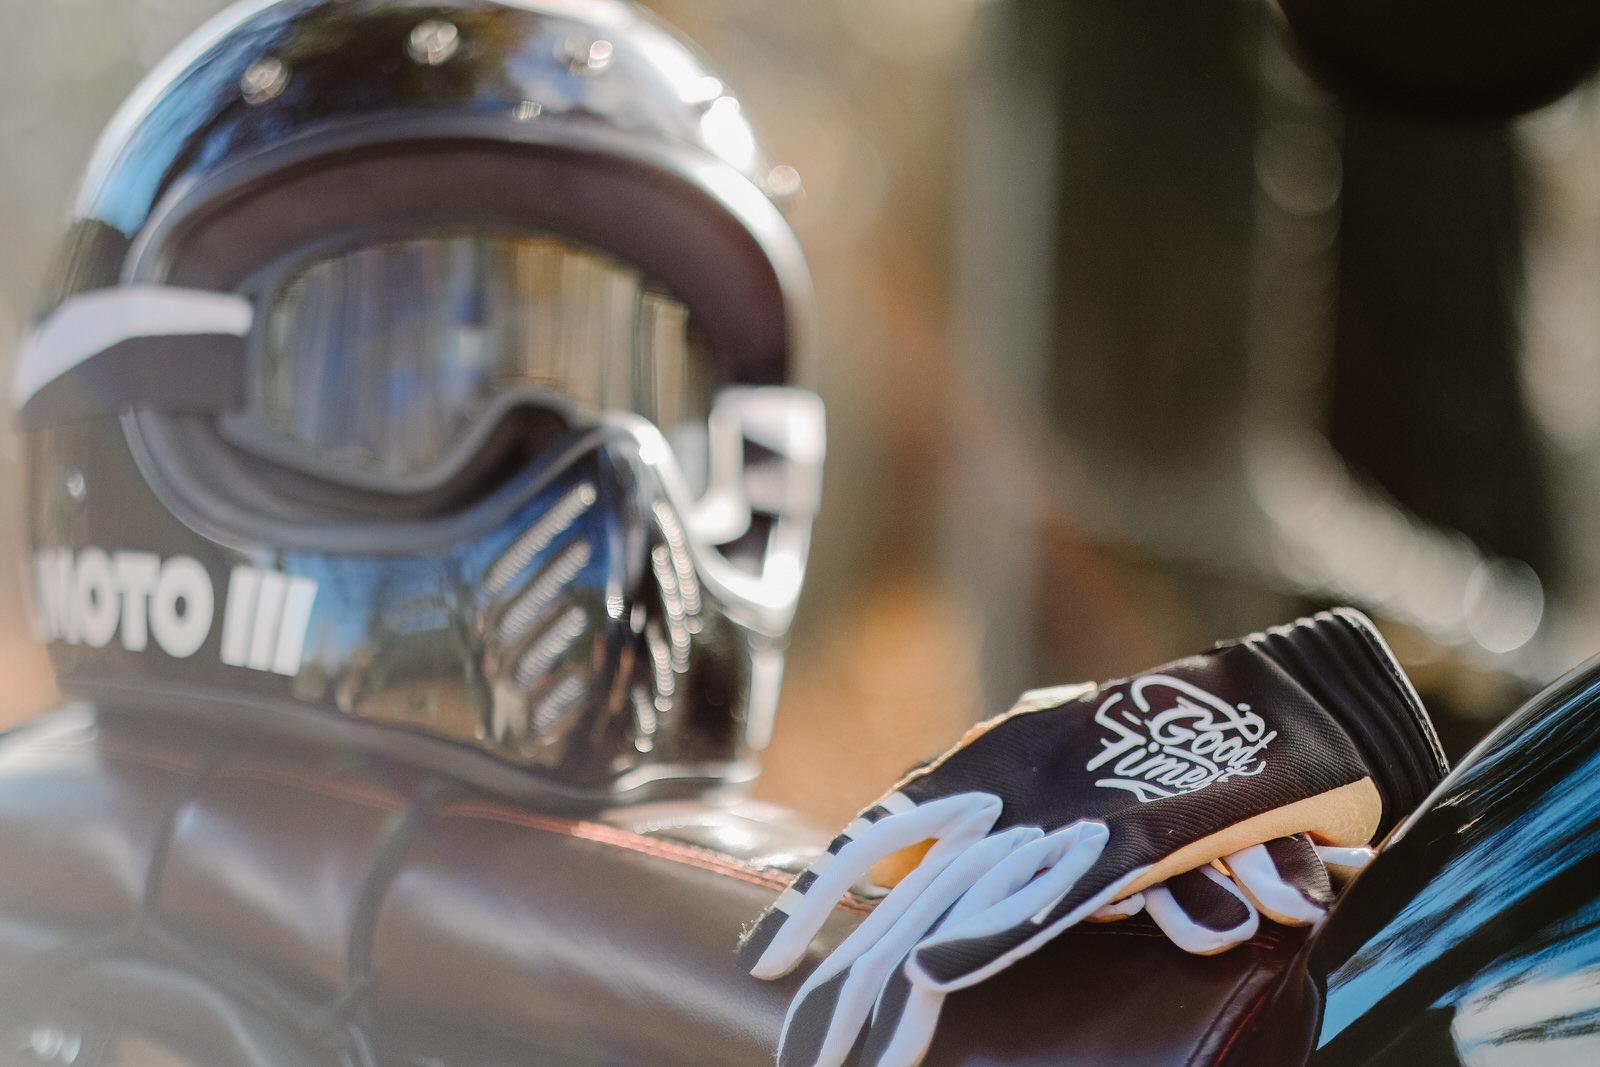 Motorcycles Bullit Brixton mutt mash fotógrafo motas preco Porto Portugal